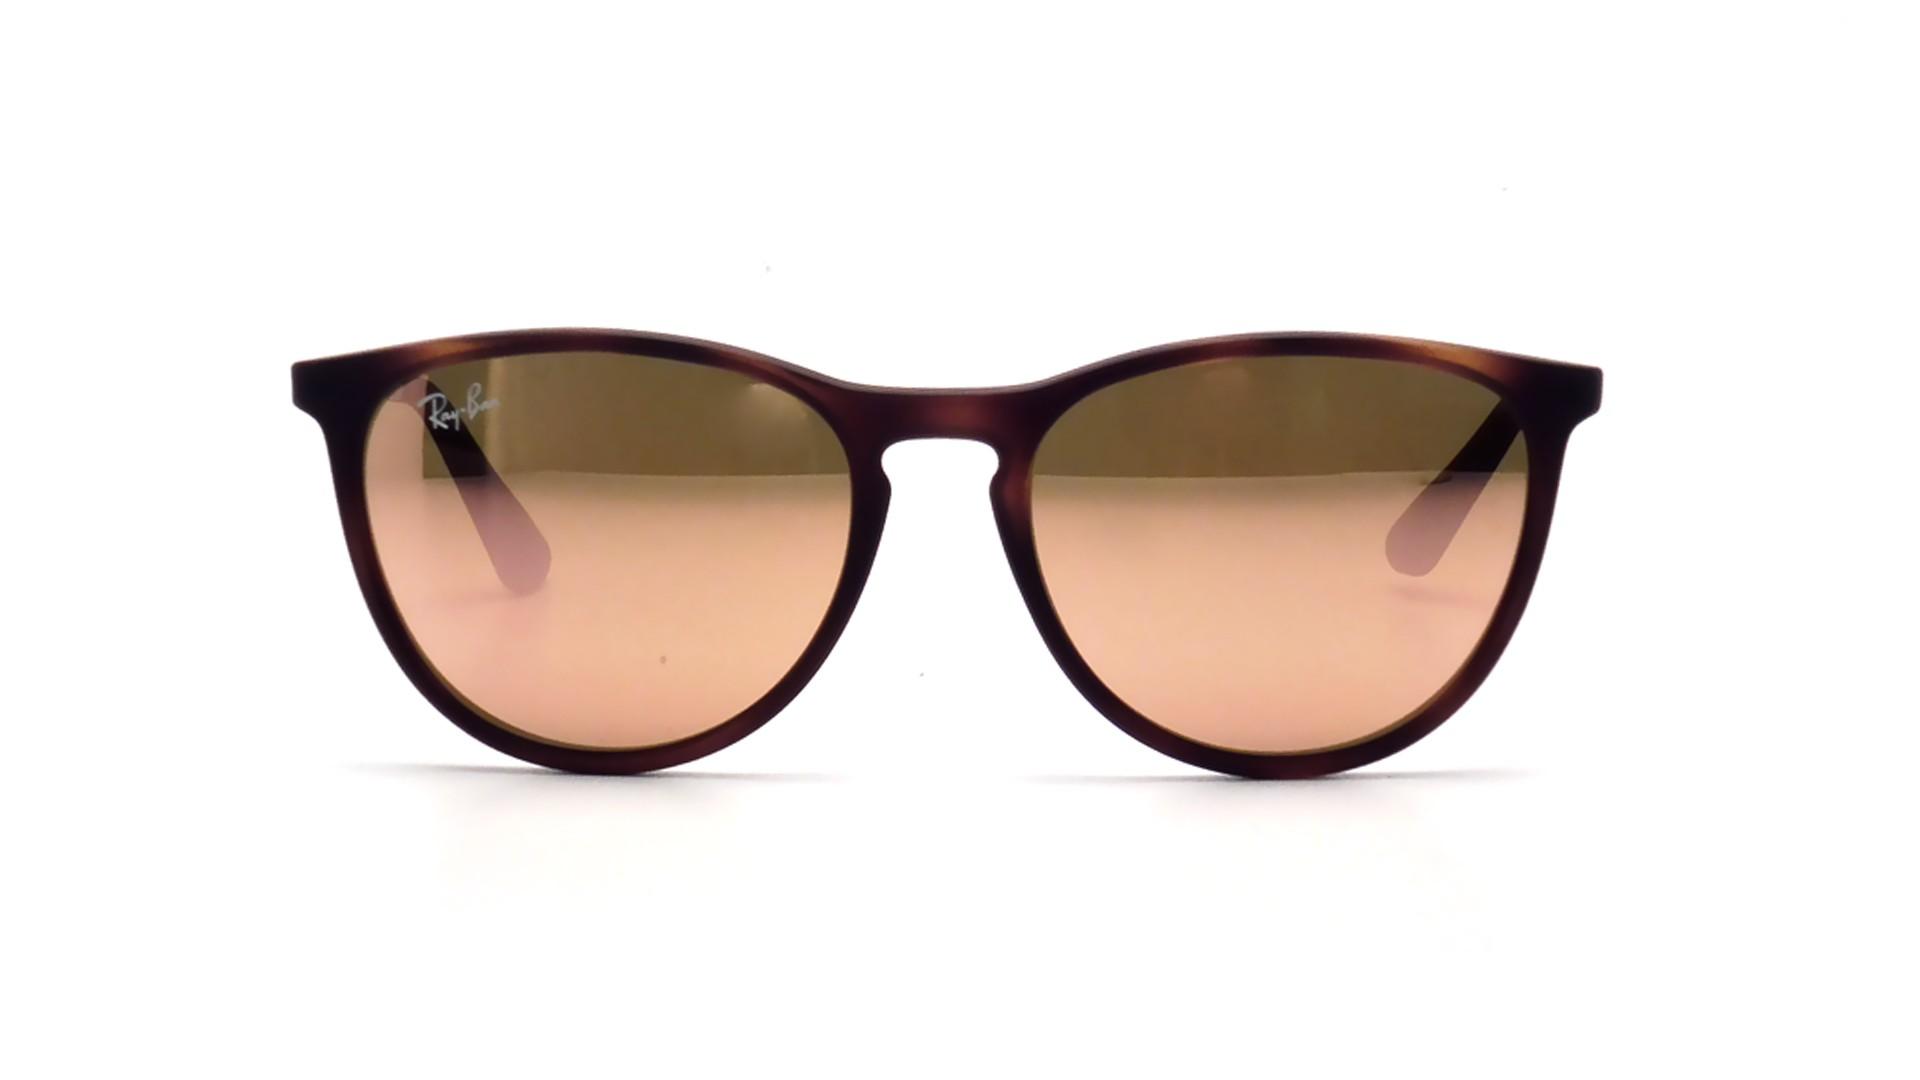 7780b33a82 Sunglasses Ray-Ban Erika Havane Tortoise RJ9060S 70062Y 50-15 Junior Mirror